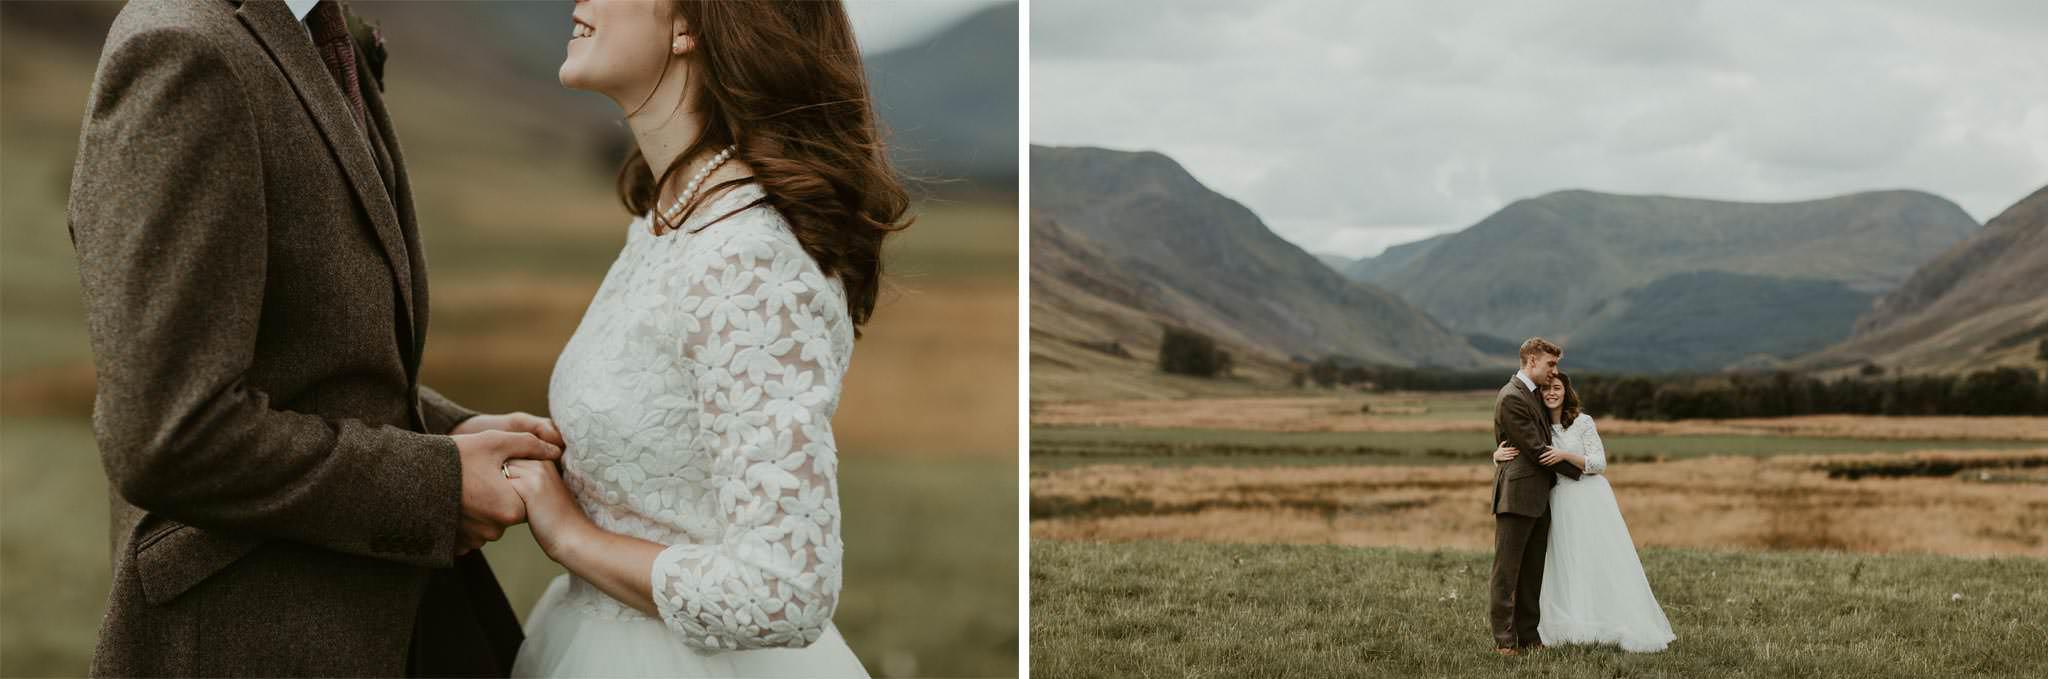 scotland-wedding-photographer-124